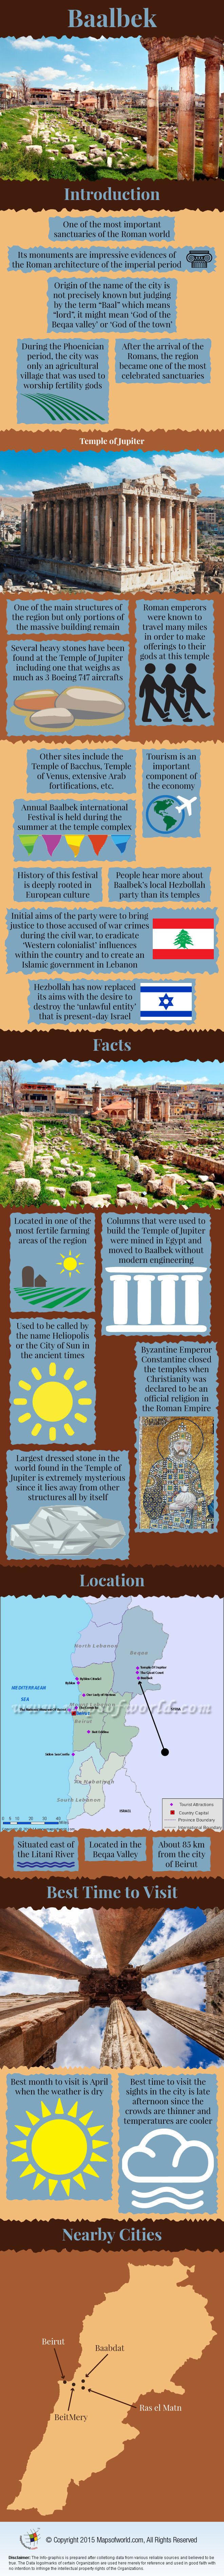 Baalbek Infographic